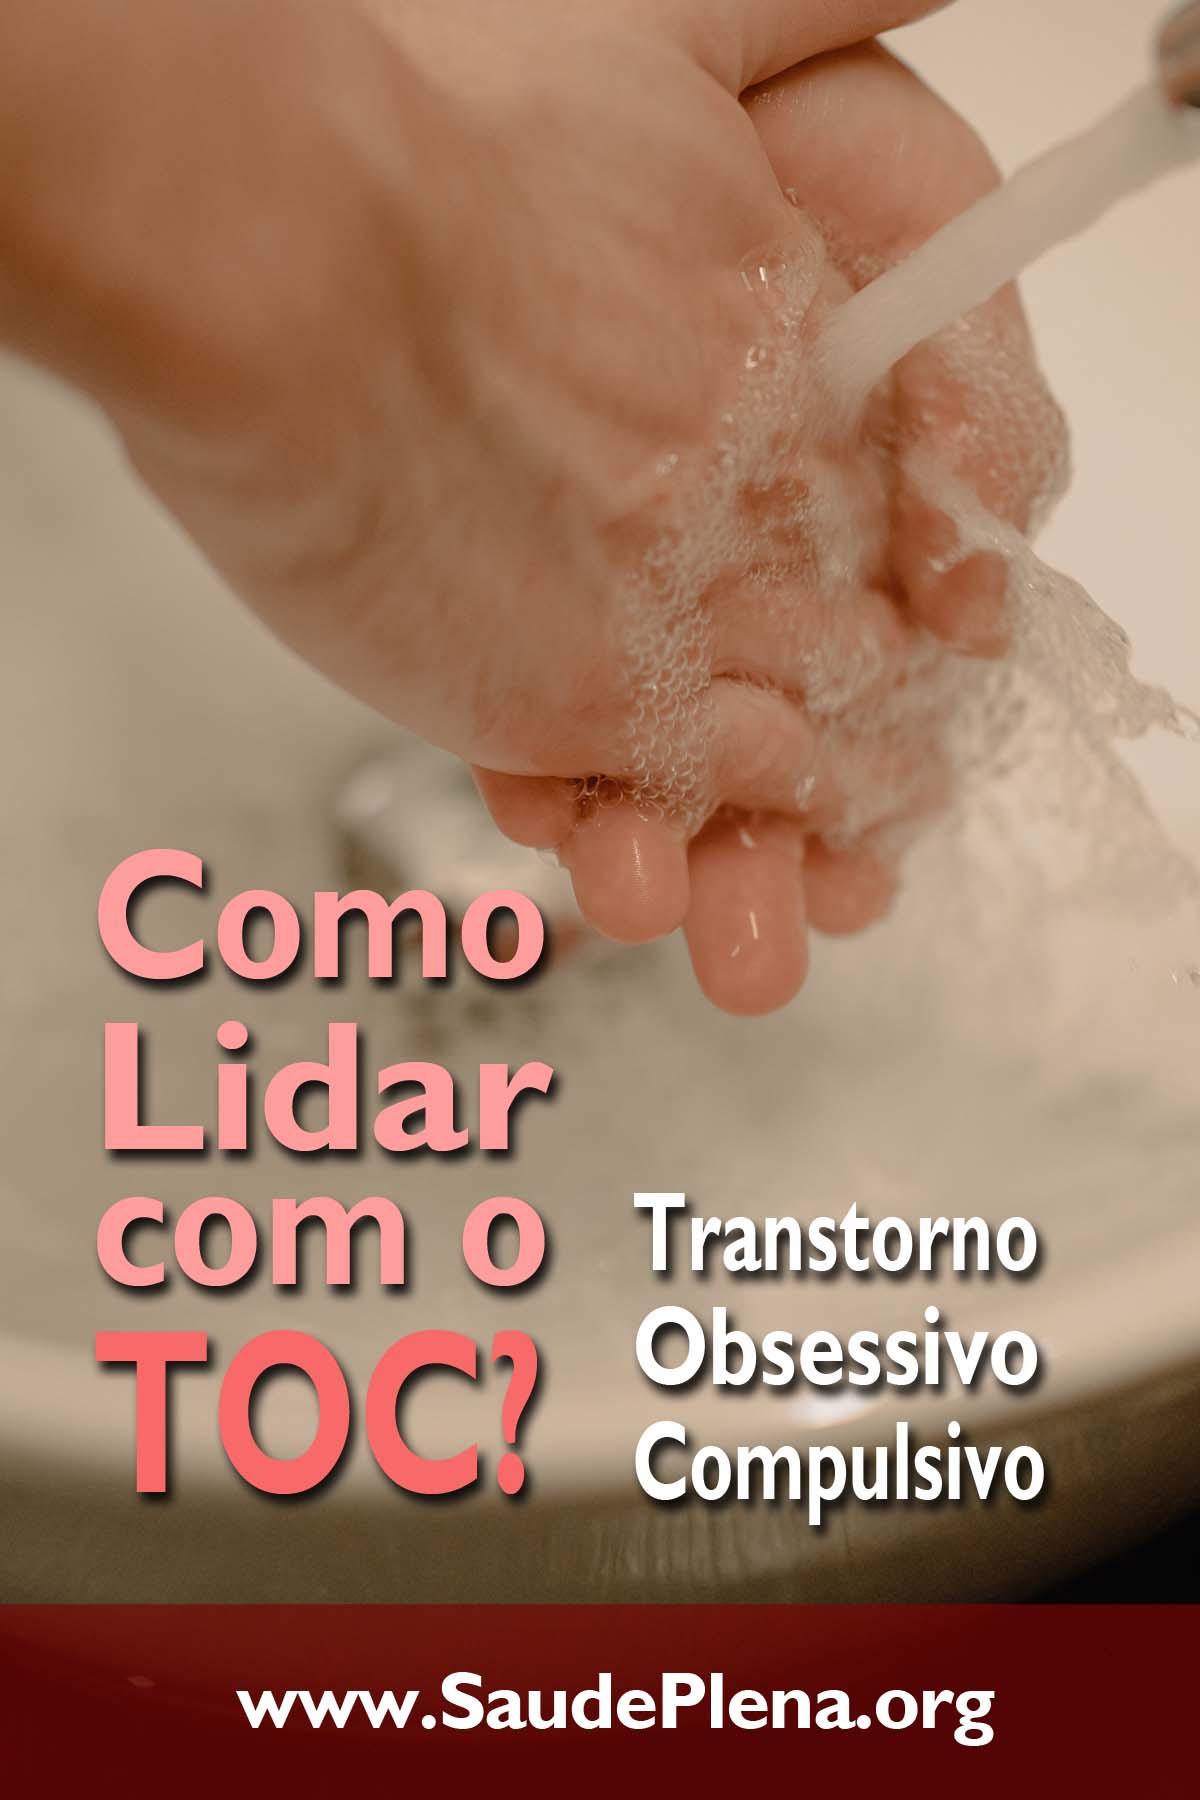 Como Lidar com o TOC - Transtorno Obsessivo Compulsivo?